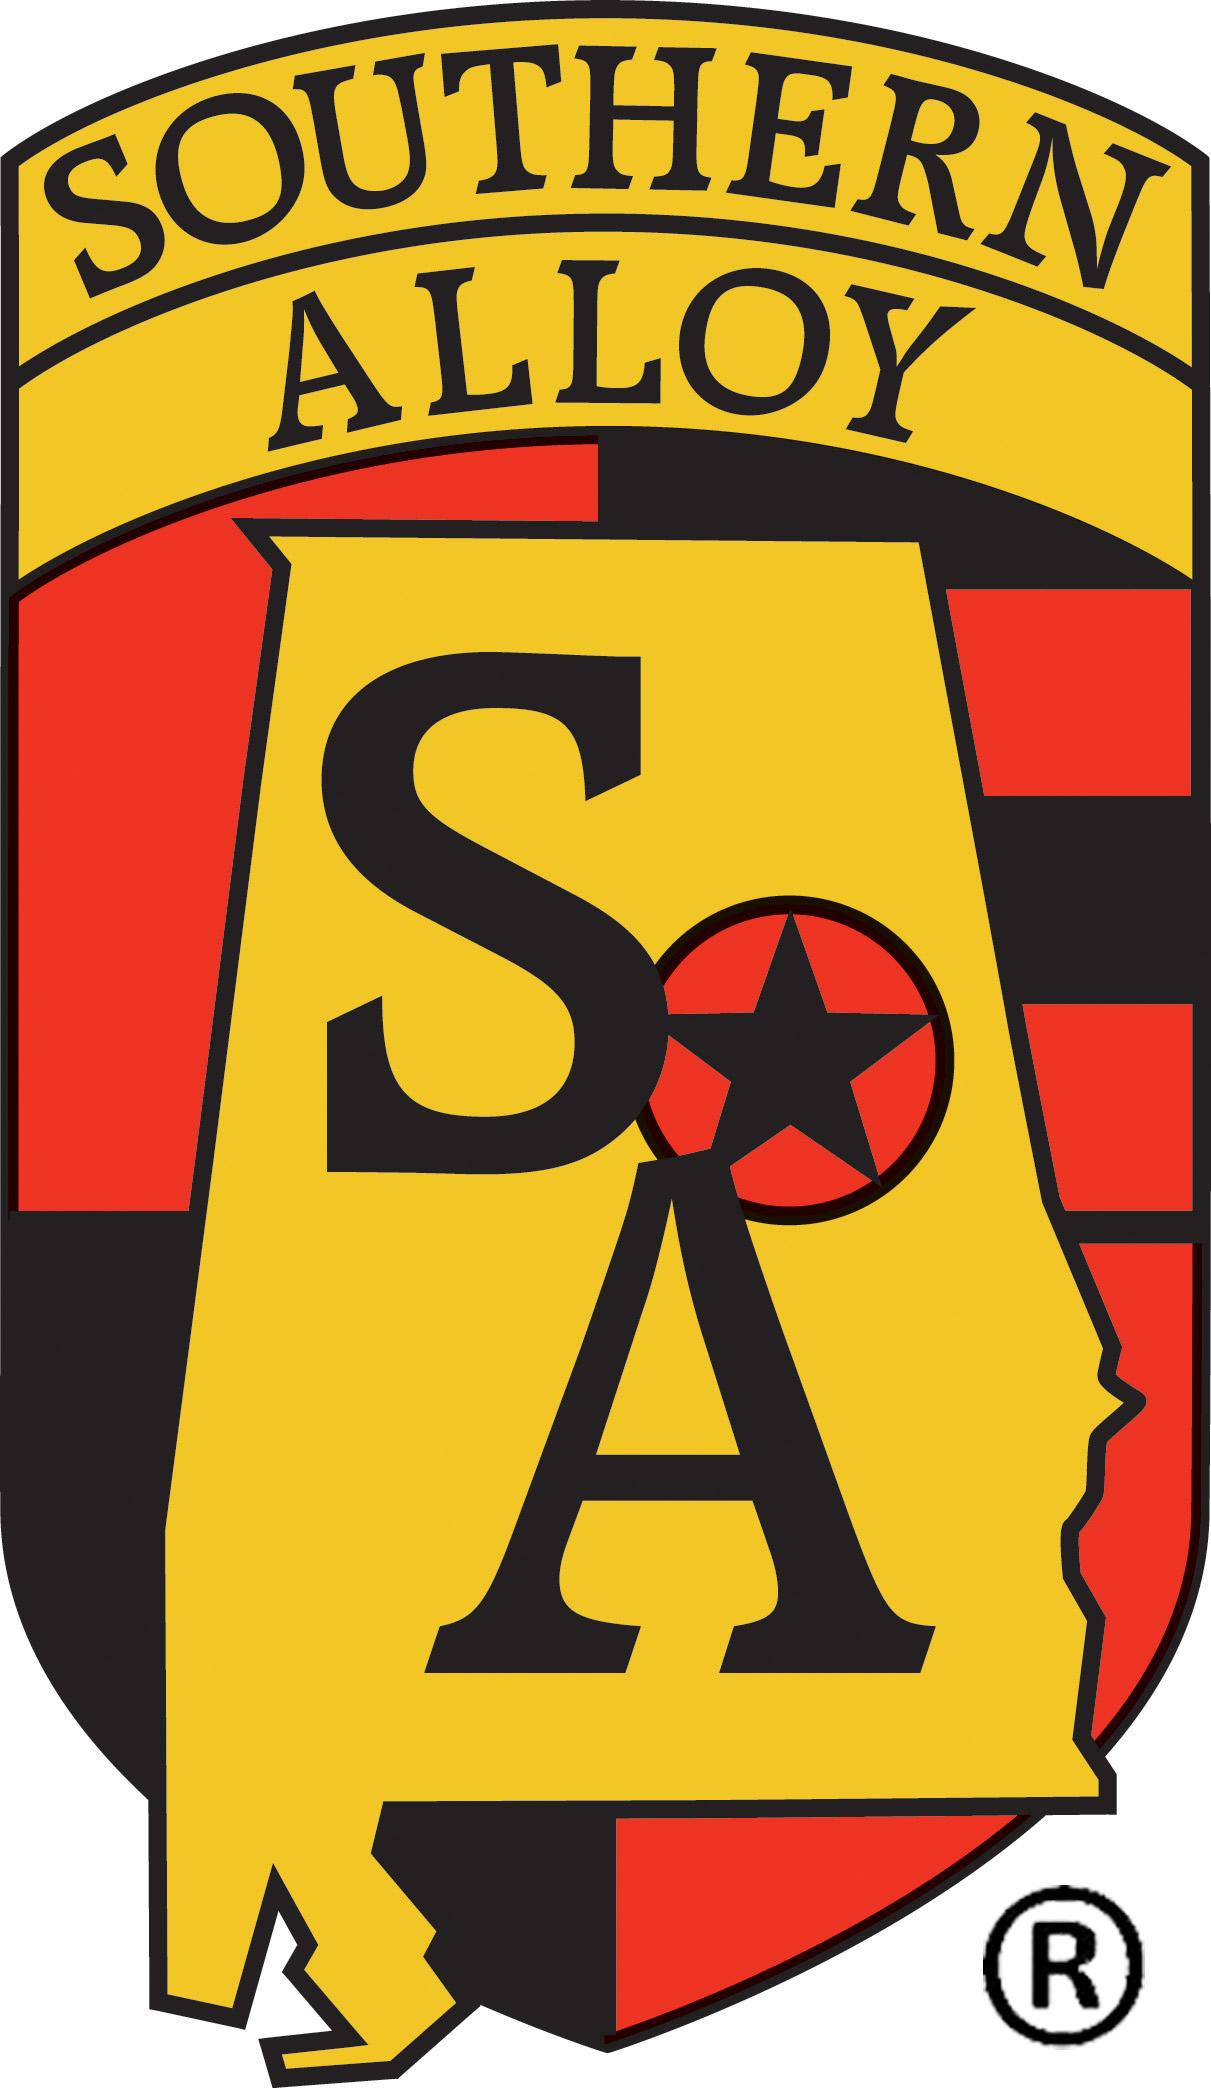 Southern Alloy logo